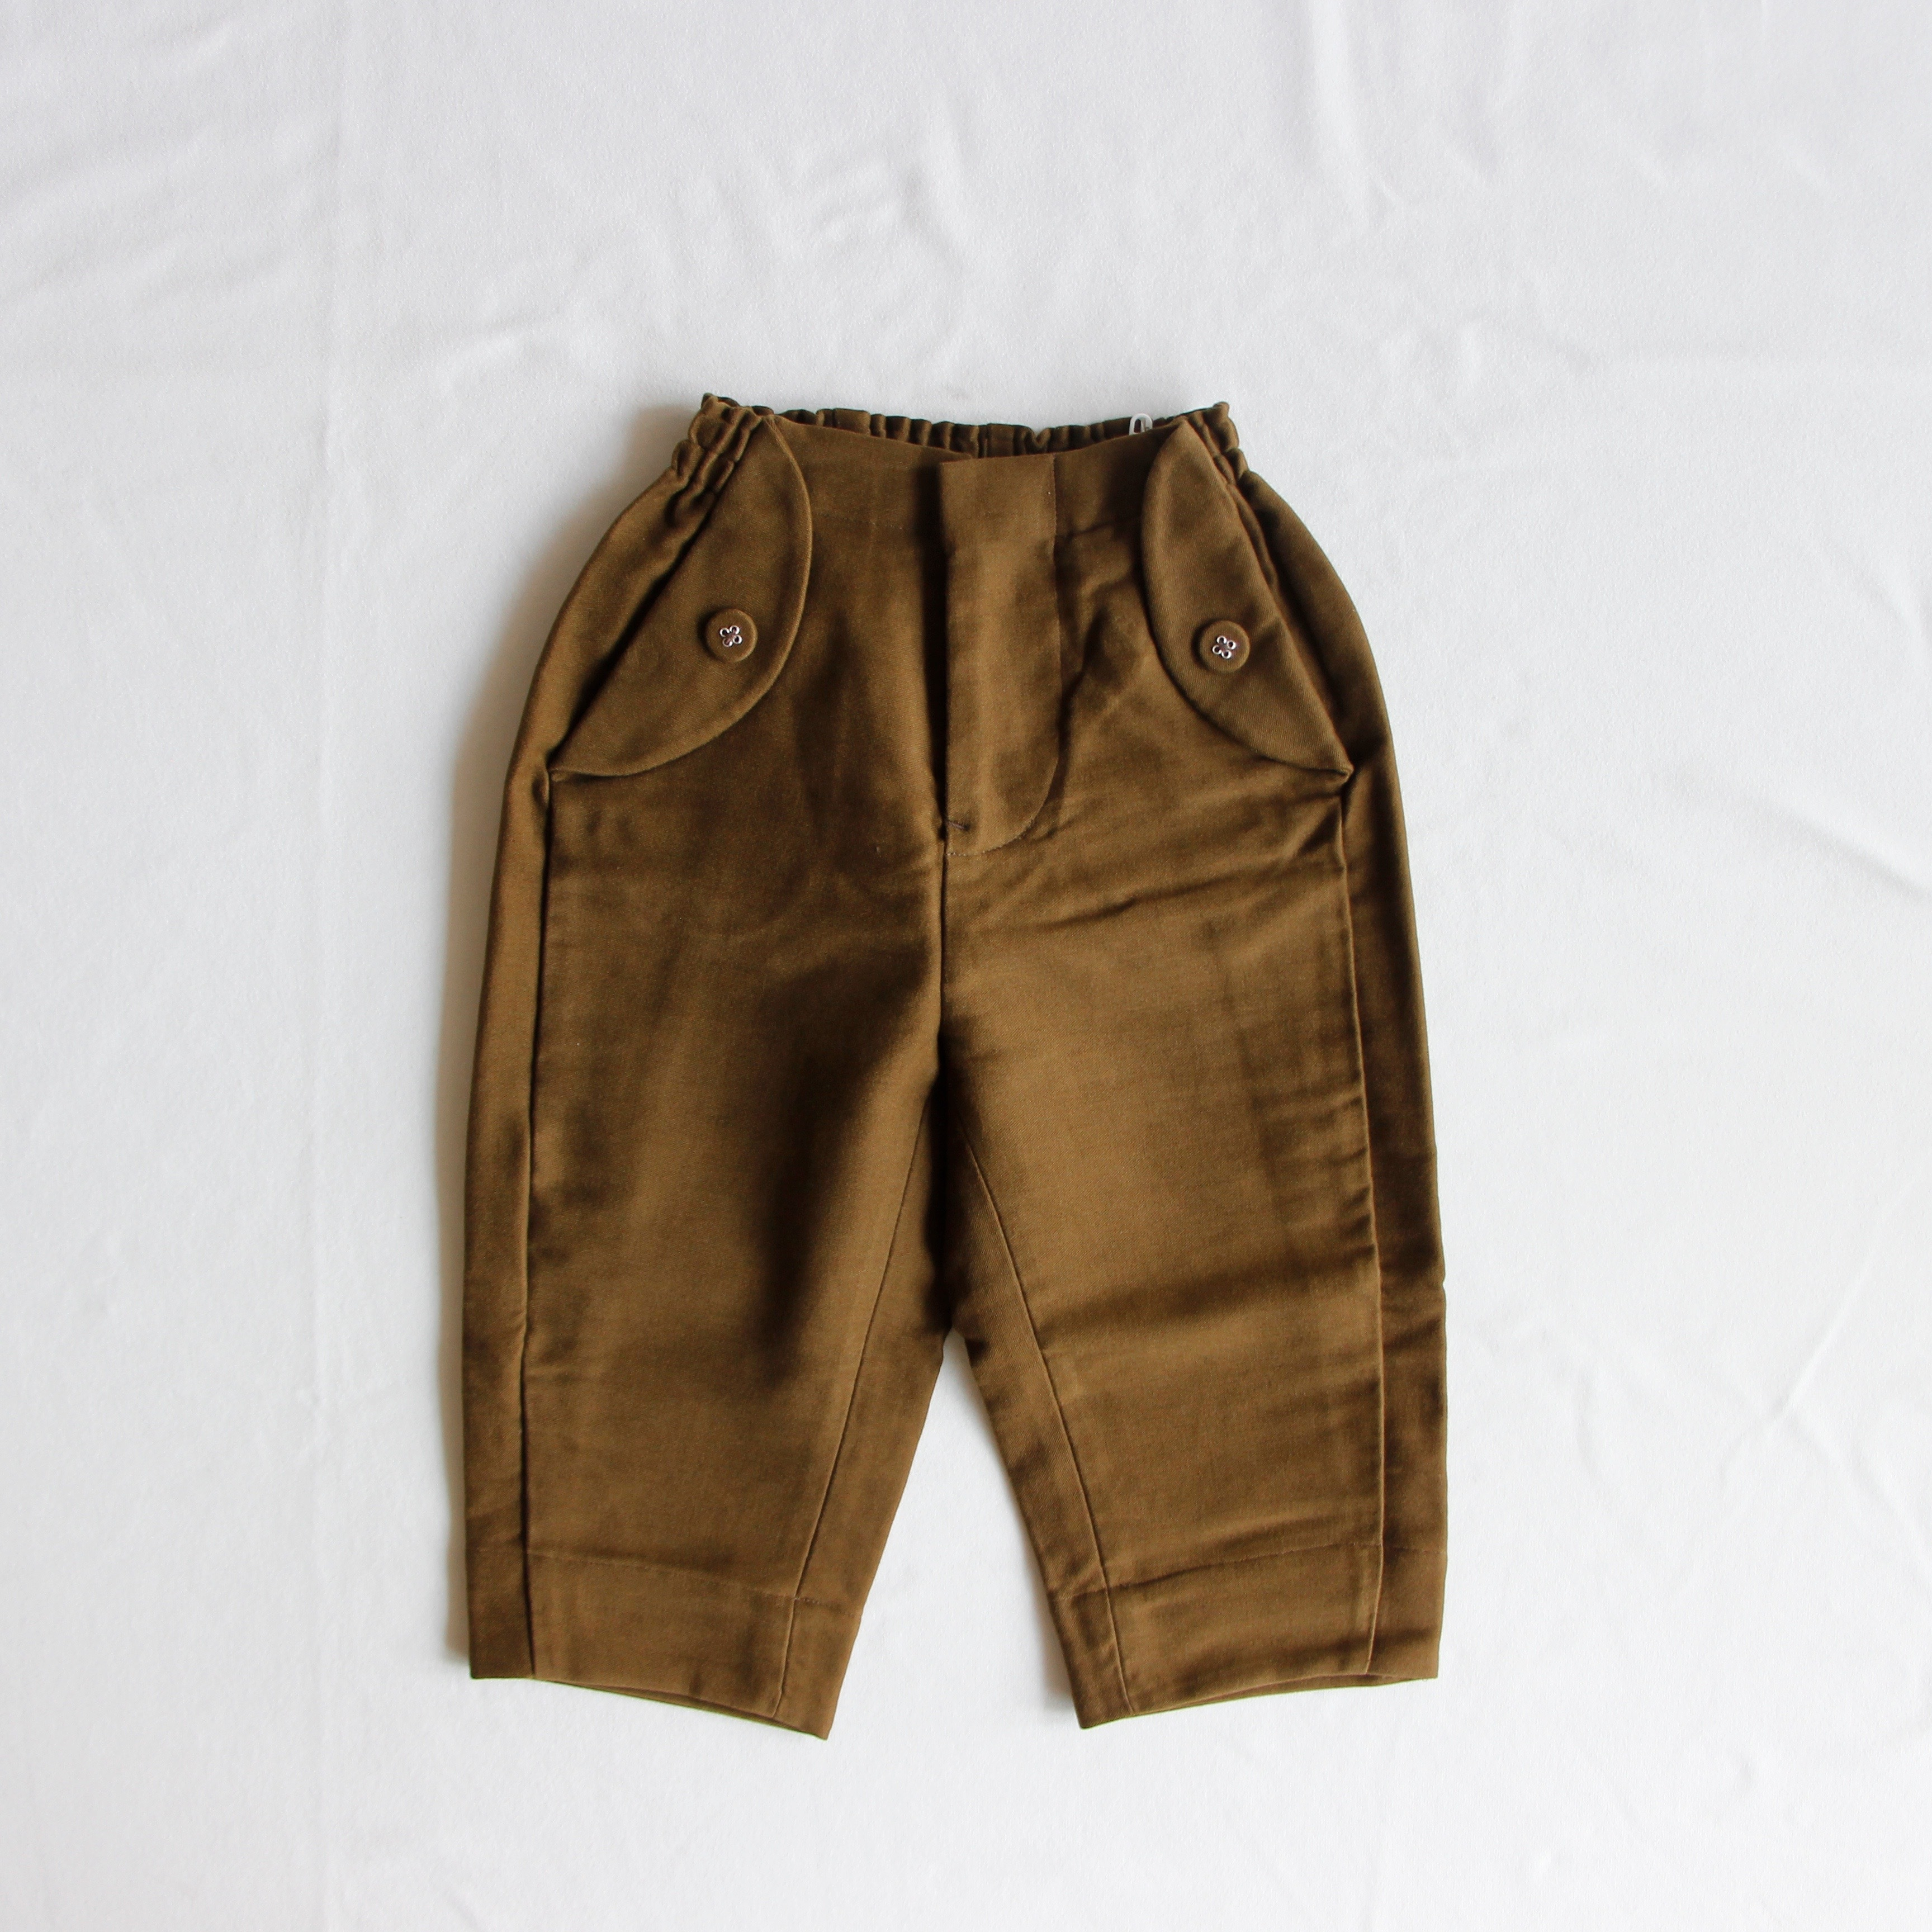 《mina perhonen 2019AW》bonbon パンツ / khaki / 110-140cm